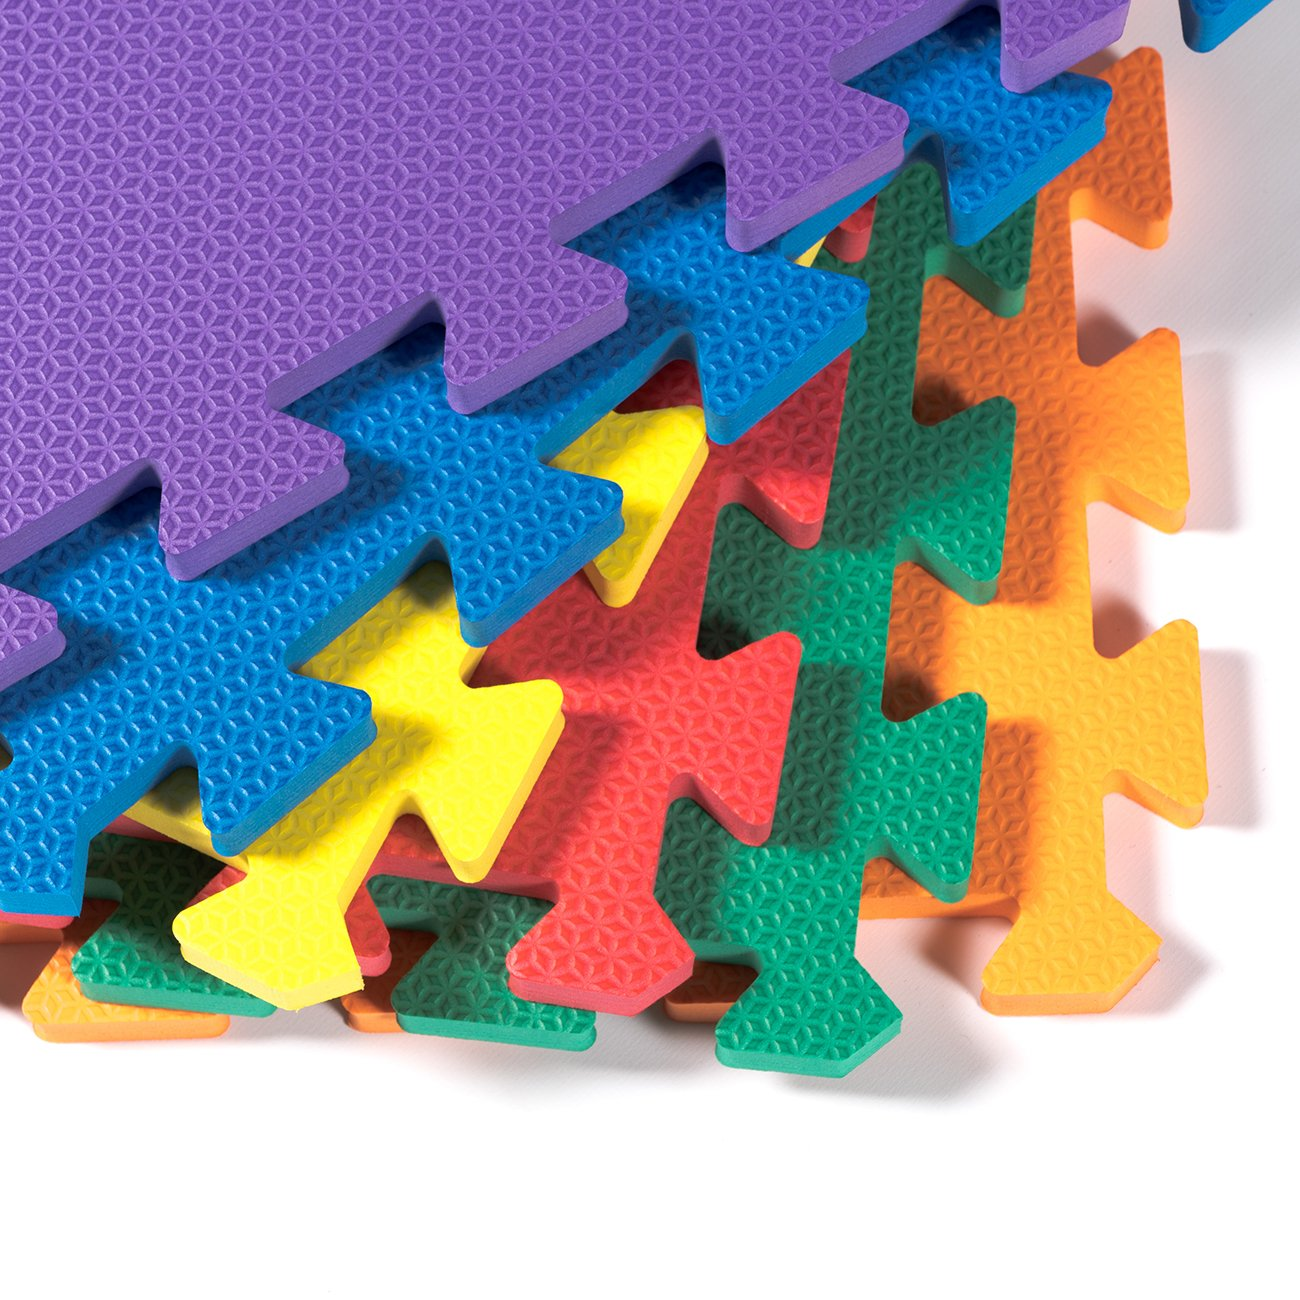 "Kidzone 12""x12"" 36 Piece Kids Baby Play Mat Foam Puzzle Play Mat EVA Non-Toxic, 6 Colors 1/2"" Thick"